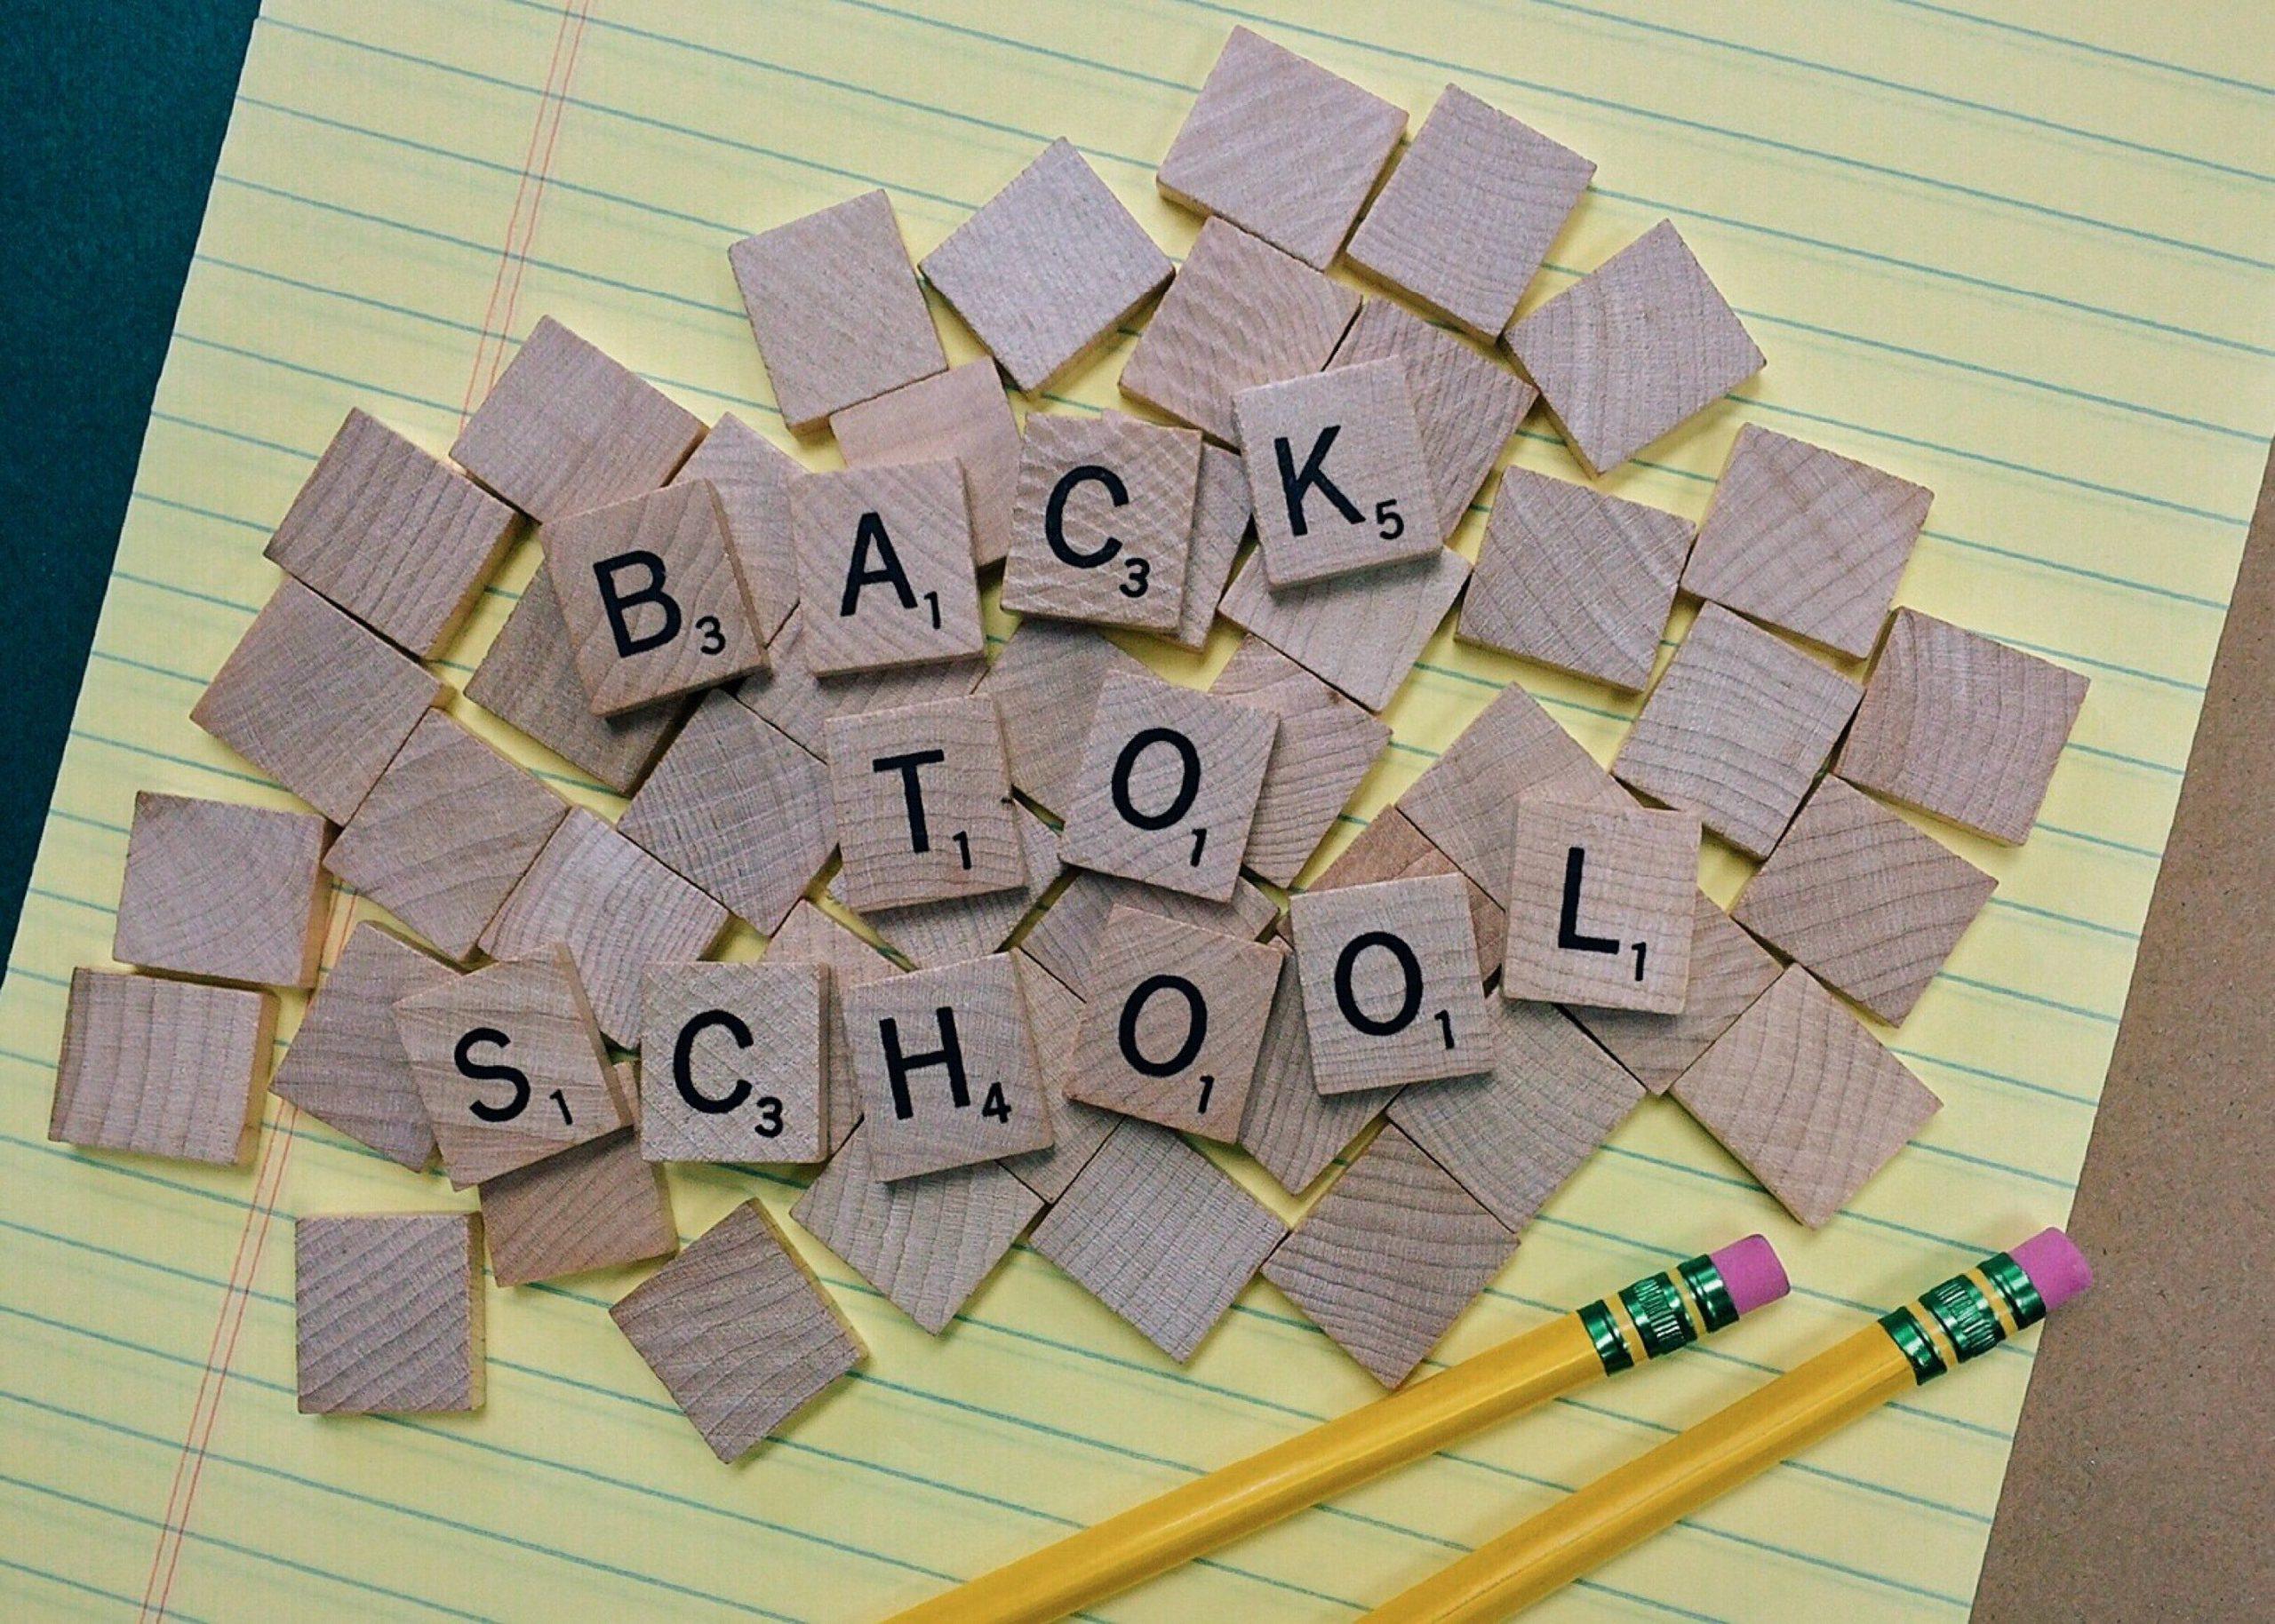 back-to-school-conceptual-creativity-207658 (2)